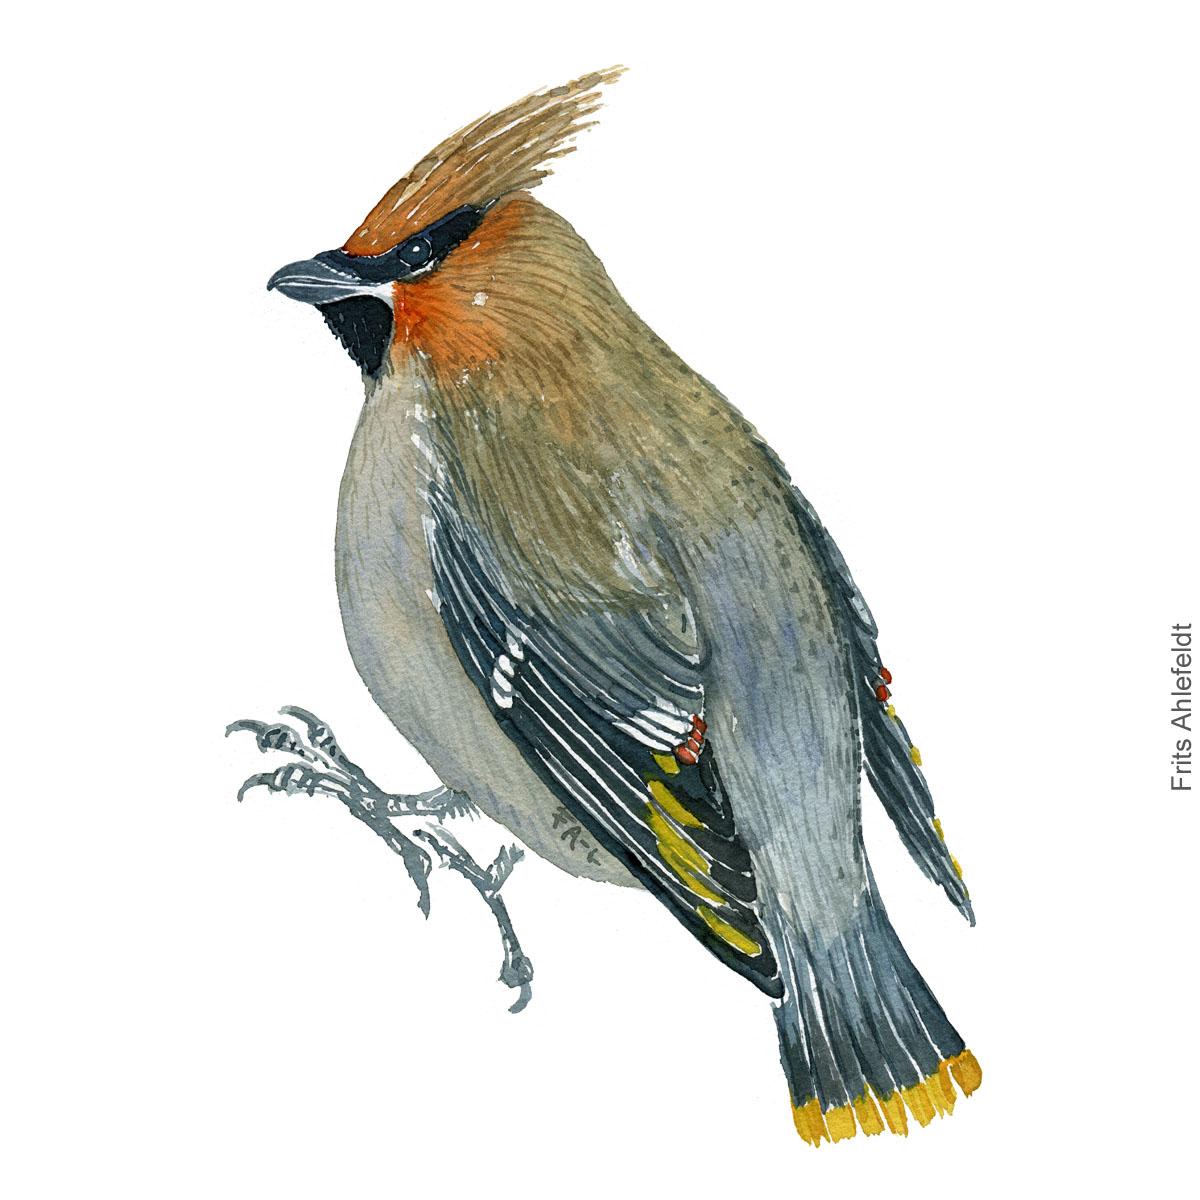 Silkehale - Bohemian waxwing - Bird painting in watercolor by Frits Ahlefeldt - Fugle akvarel